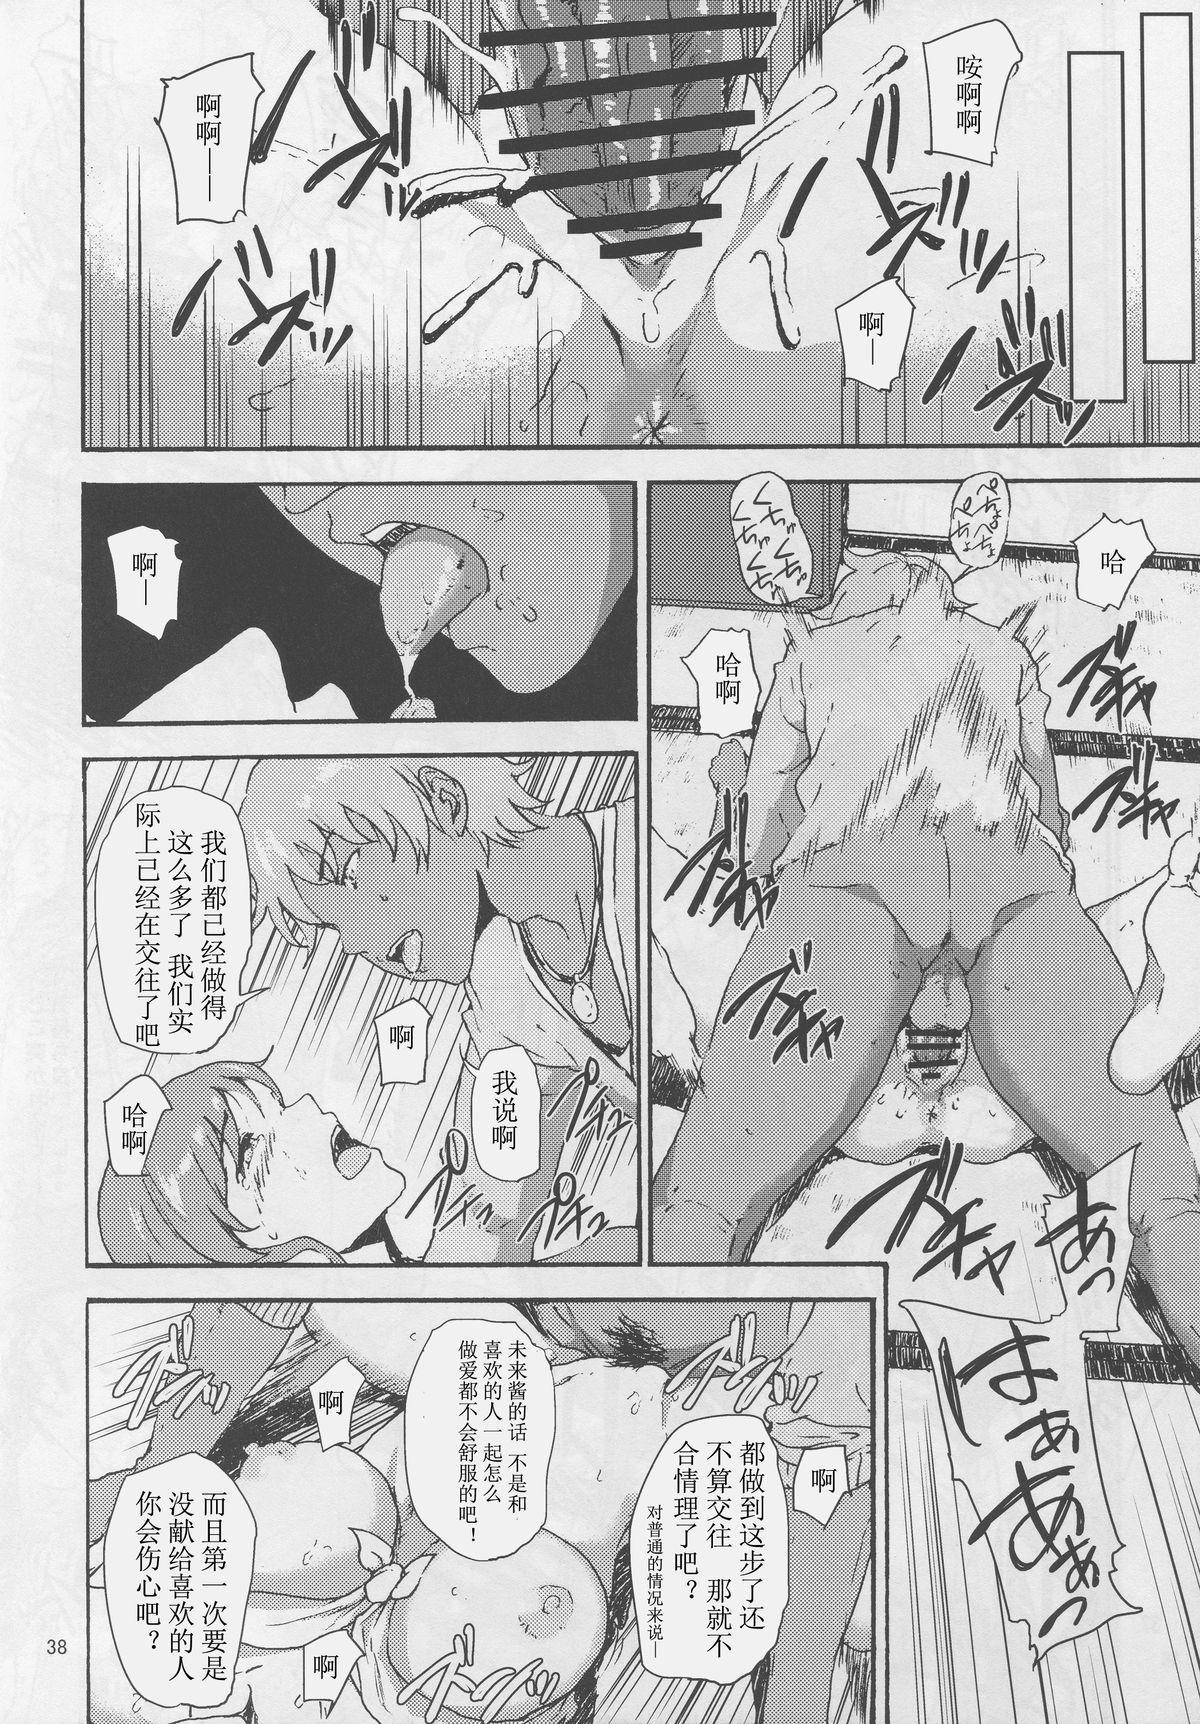 Mirai-chan ga Sandaime SGOCK no Leader ni Damasare Yarechau Hon 38